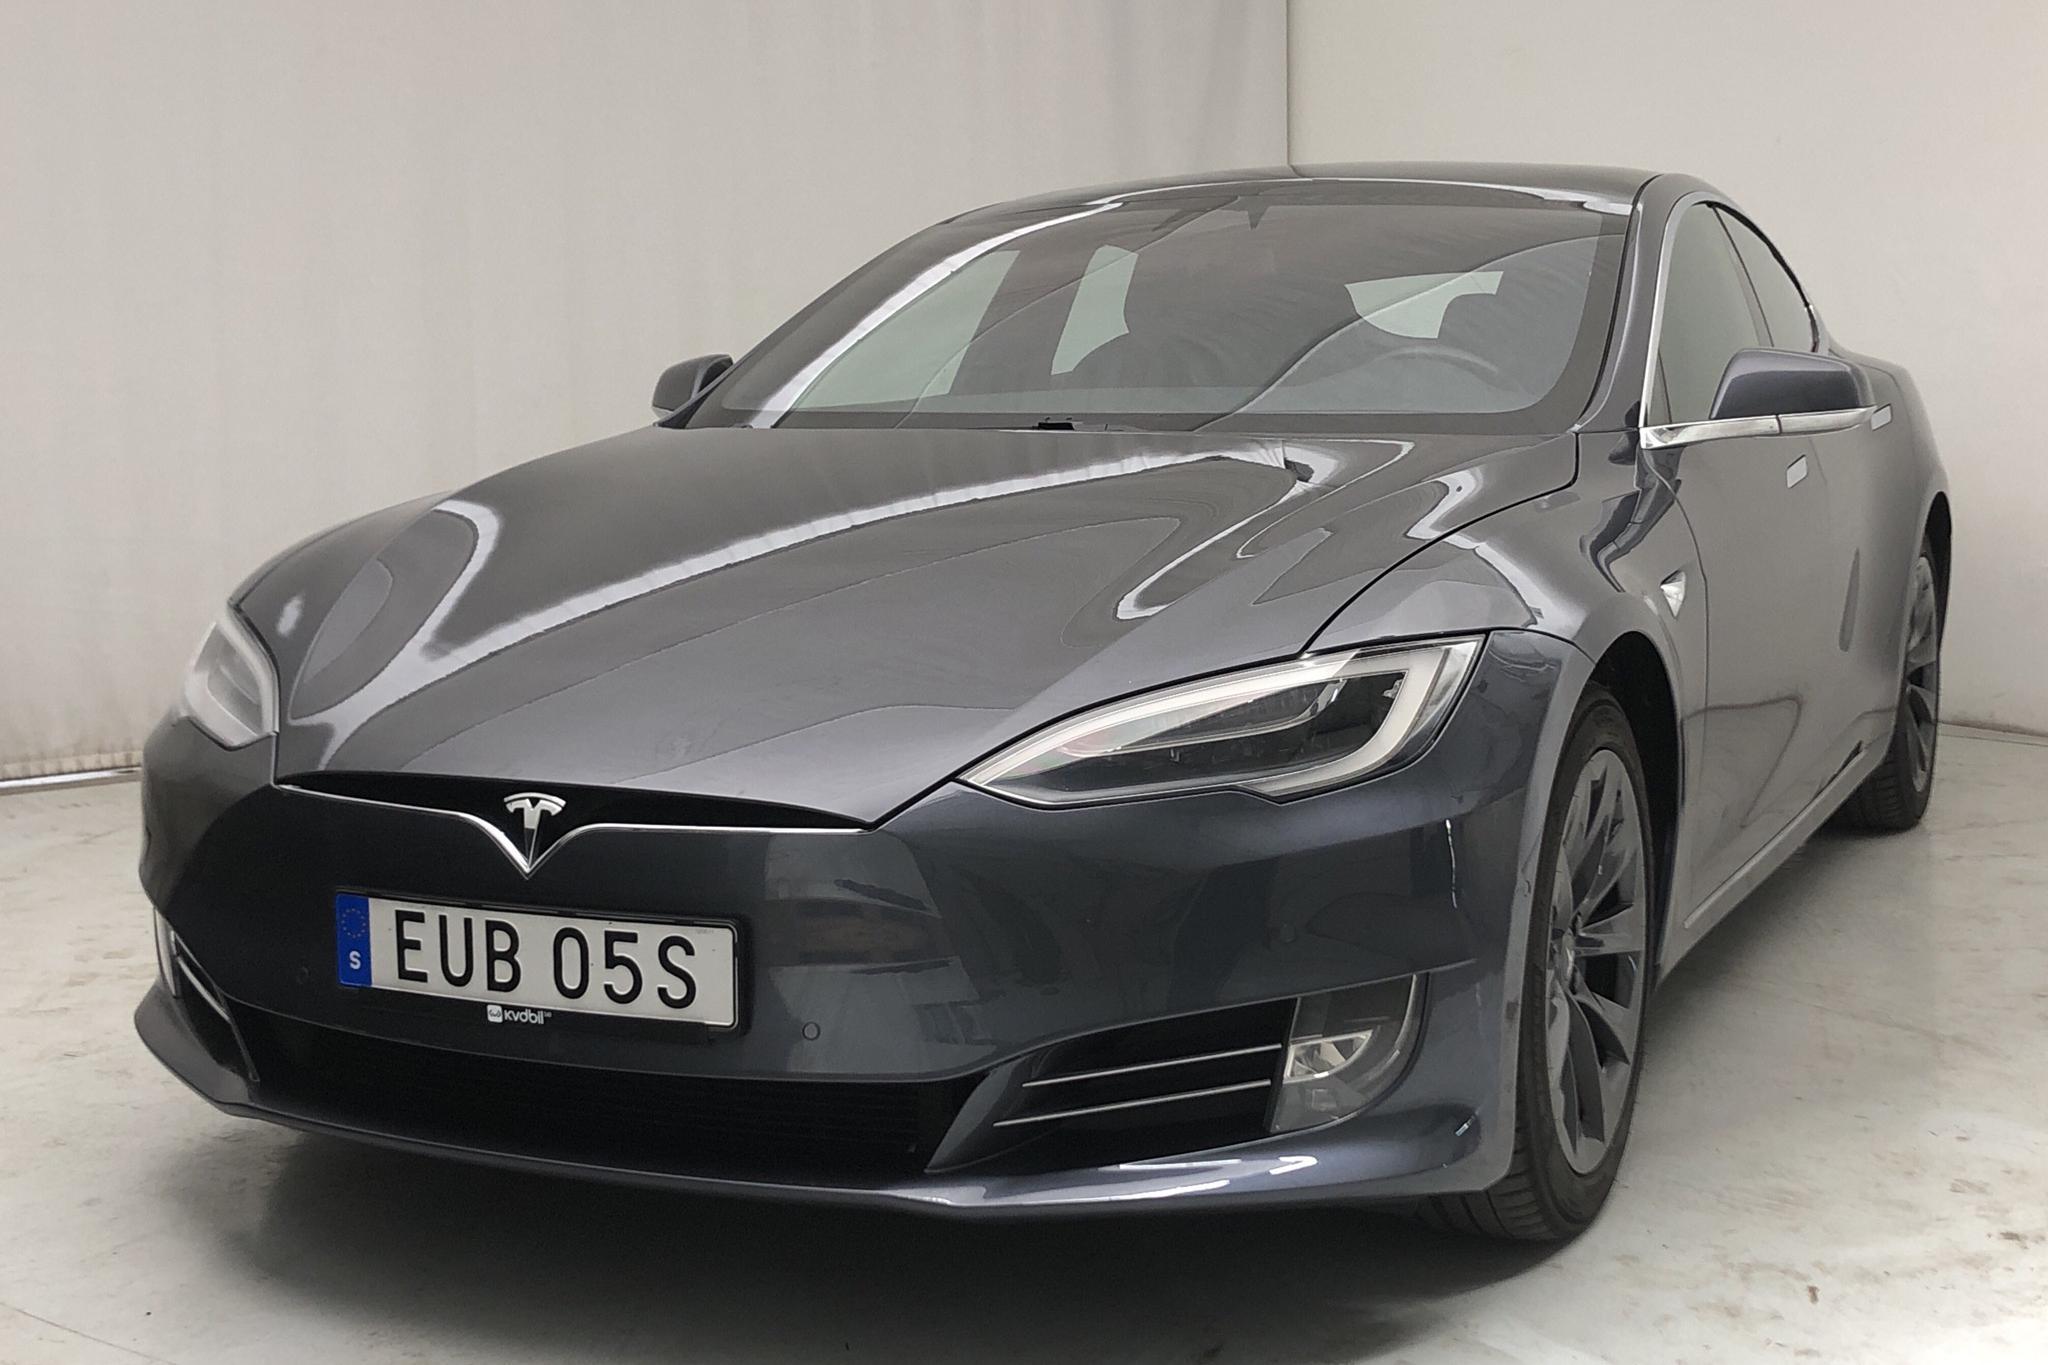 Tesla Model S 100D - 98 440 km - Automatic - gray - 2019